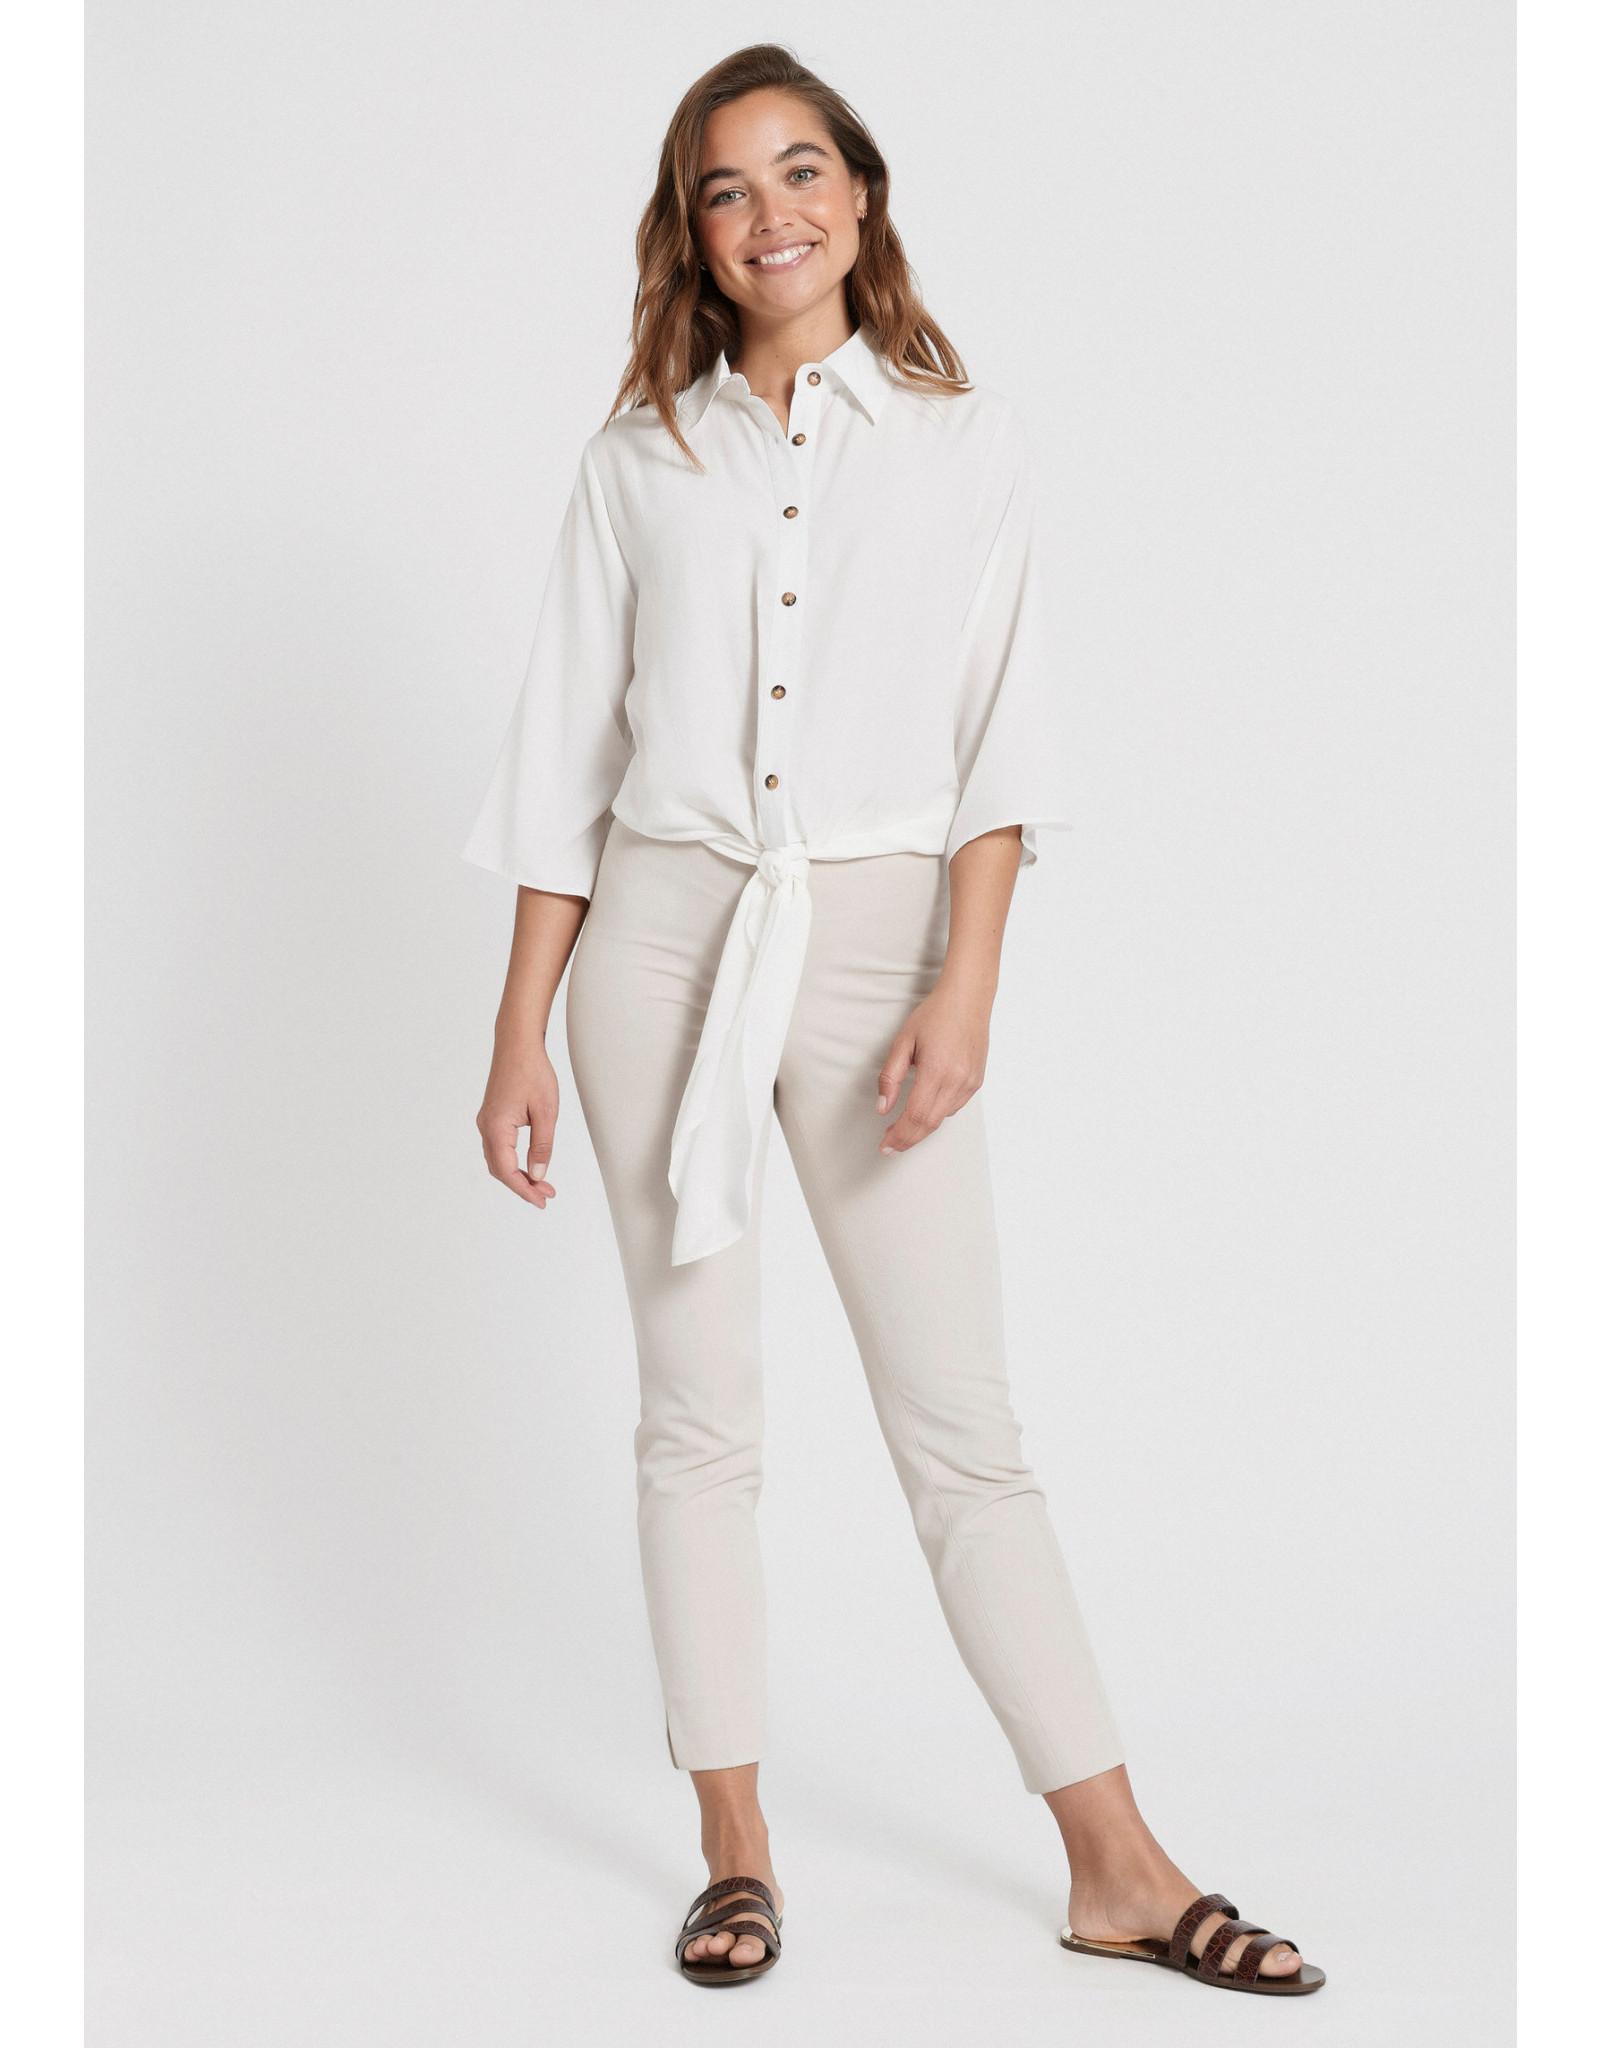 Alida blouse